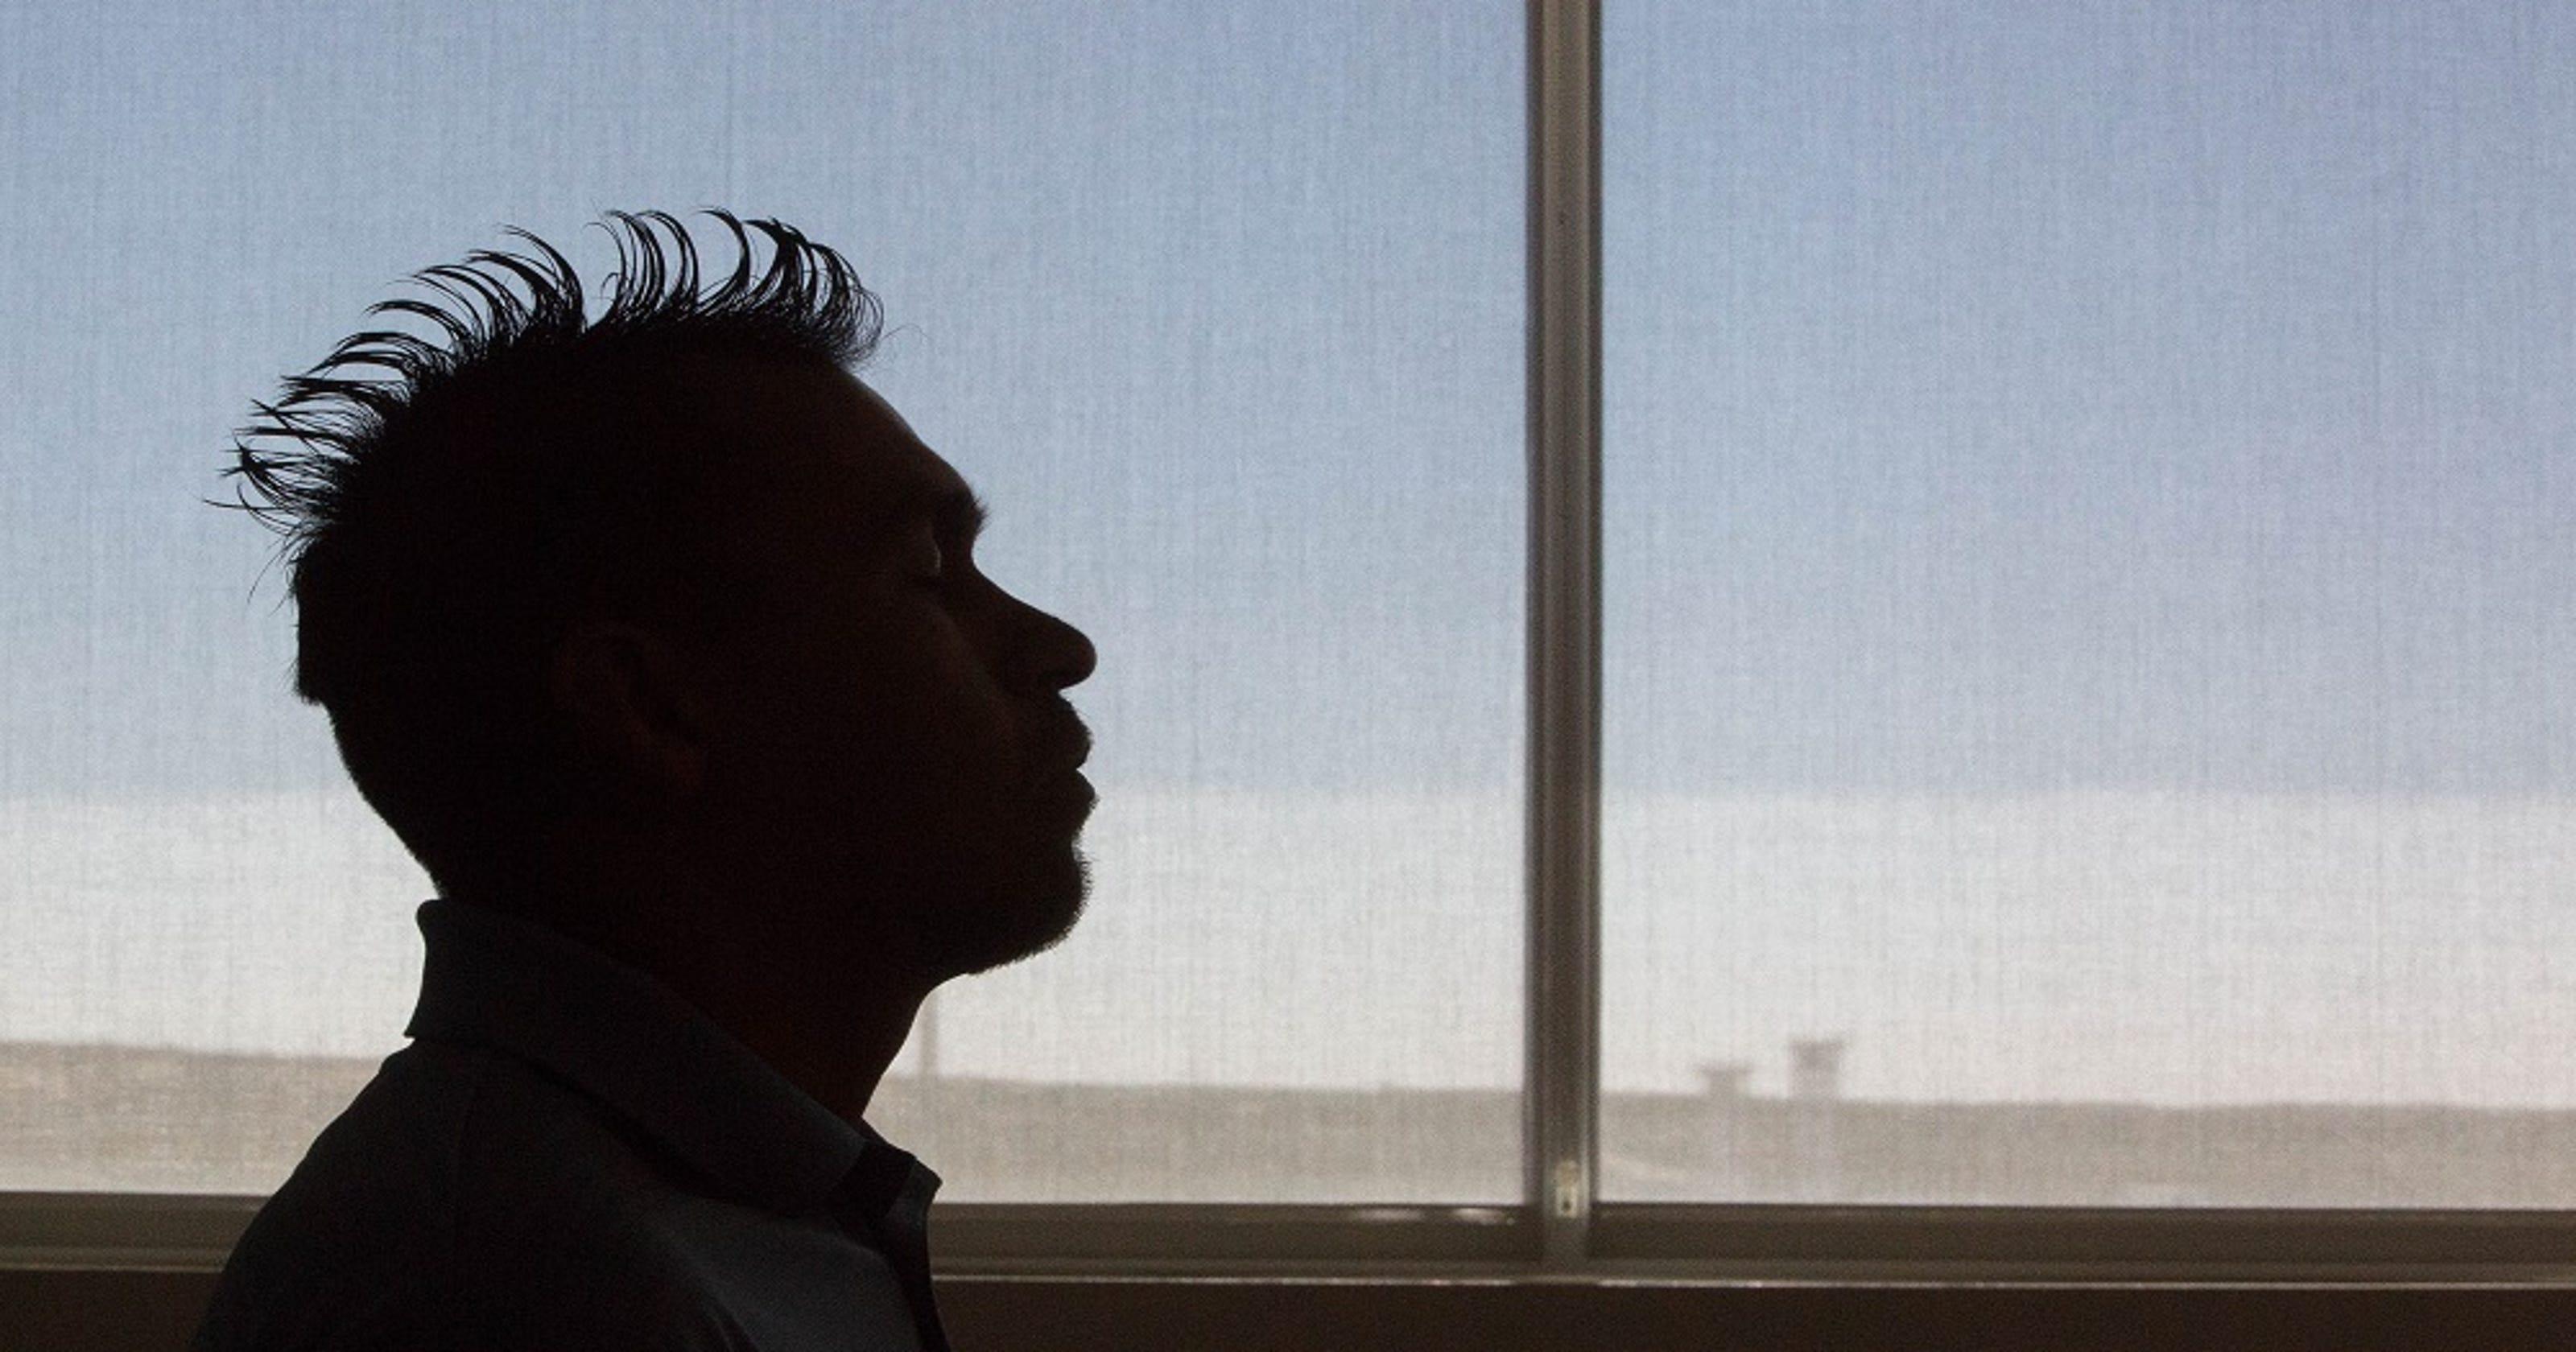 Las Cruces mindfulness program helps improve health